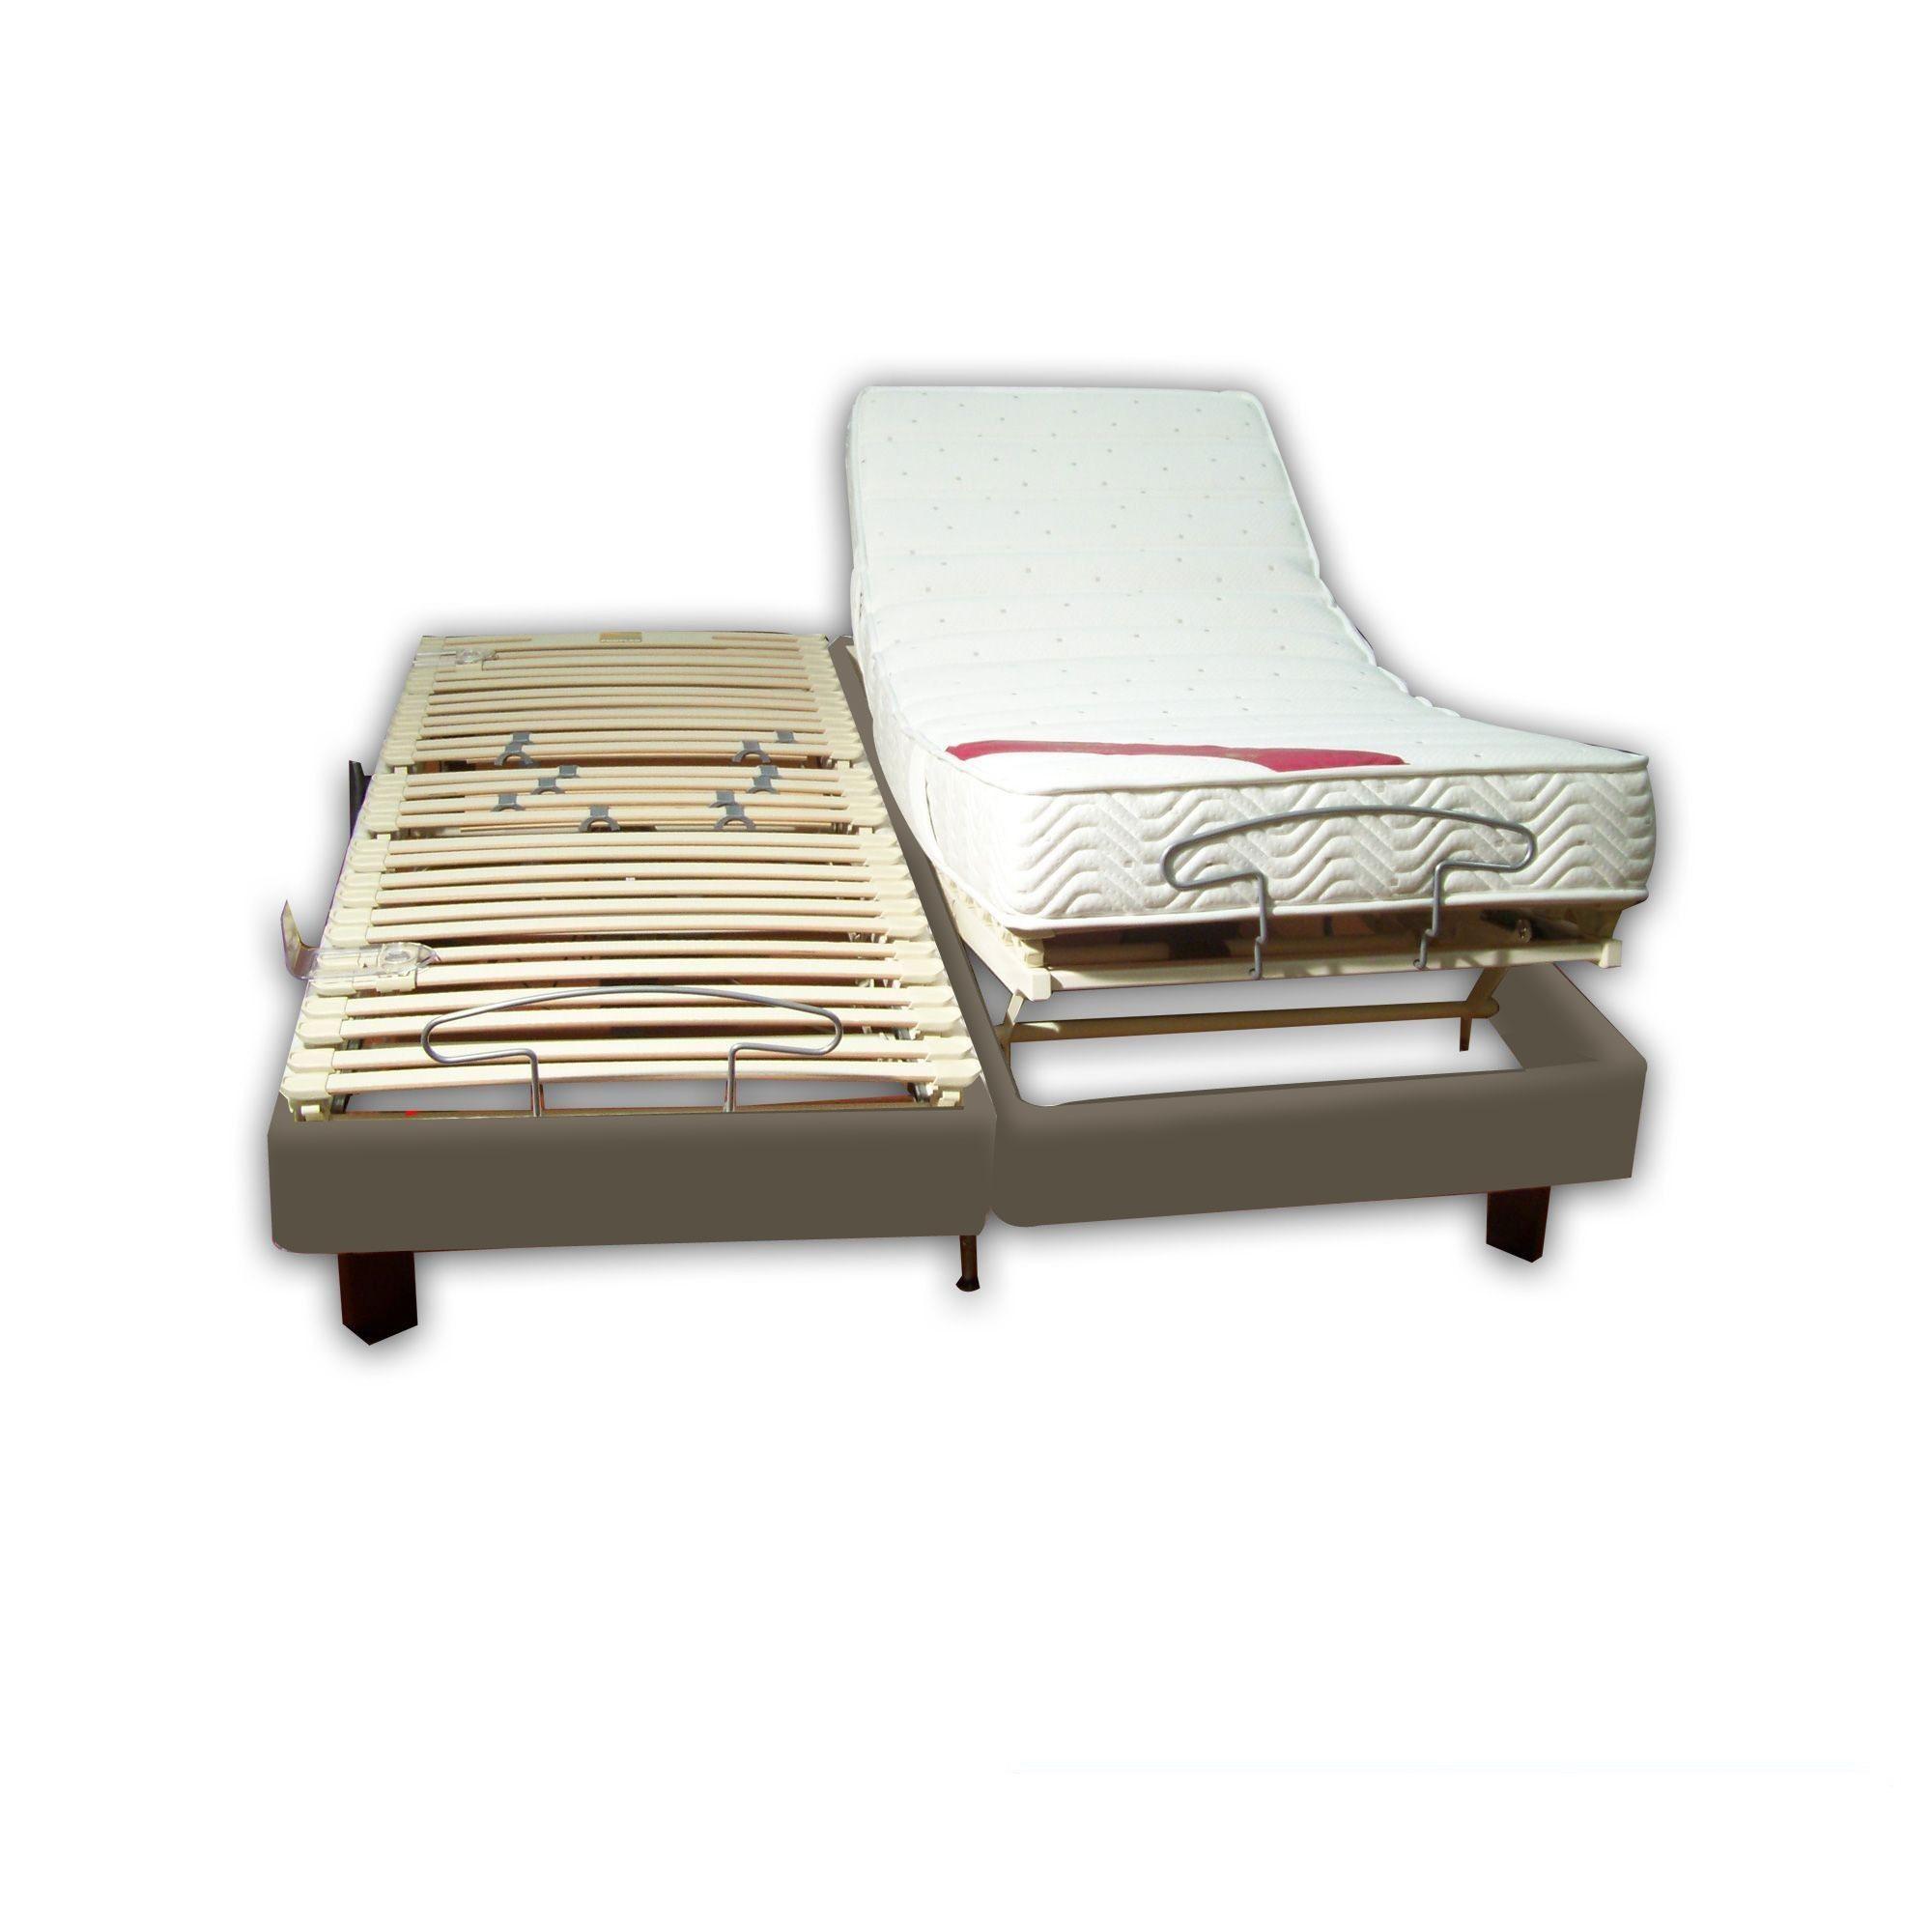 achat ensemble relaxation latex 2x90x200 clips simili cuir gris pas cher avenue literie. Black Bedroom Furniture Sets. Home Design Ideas